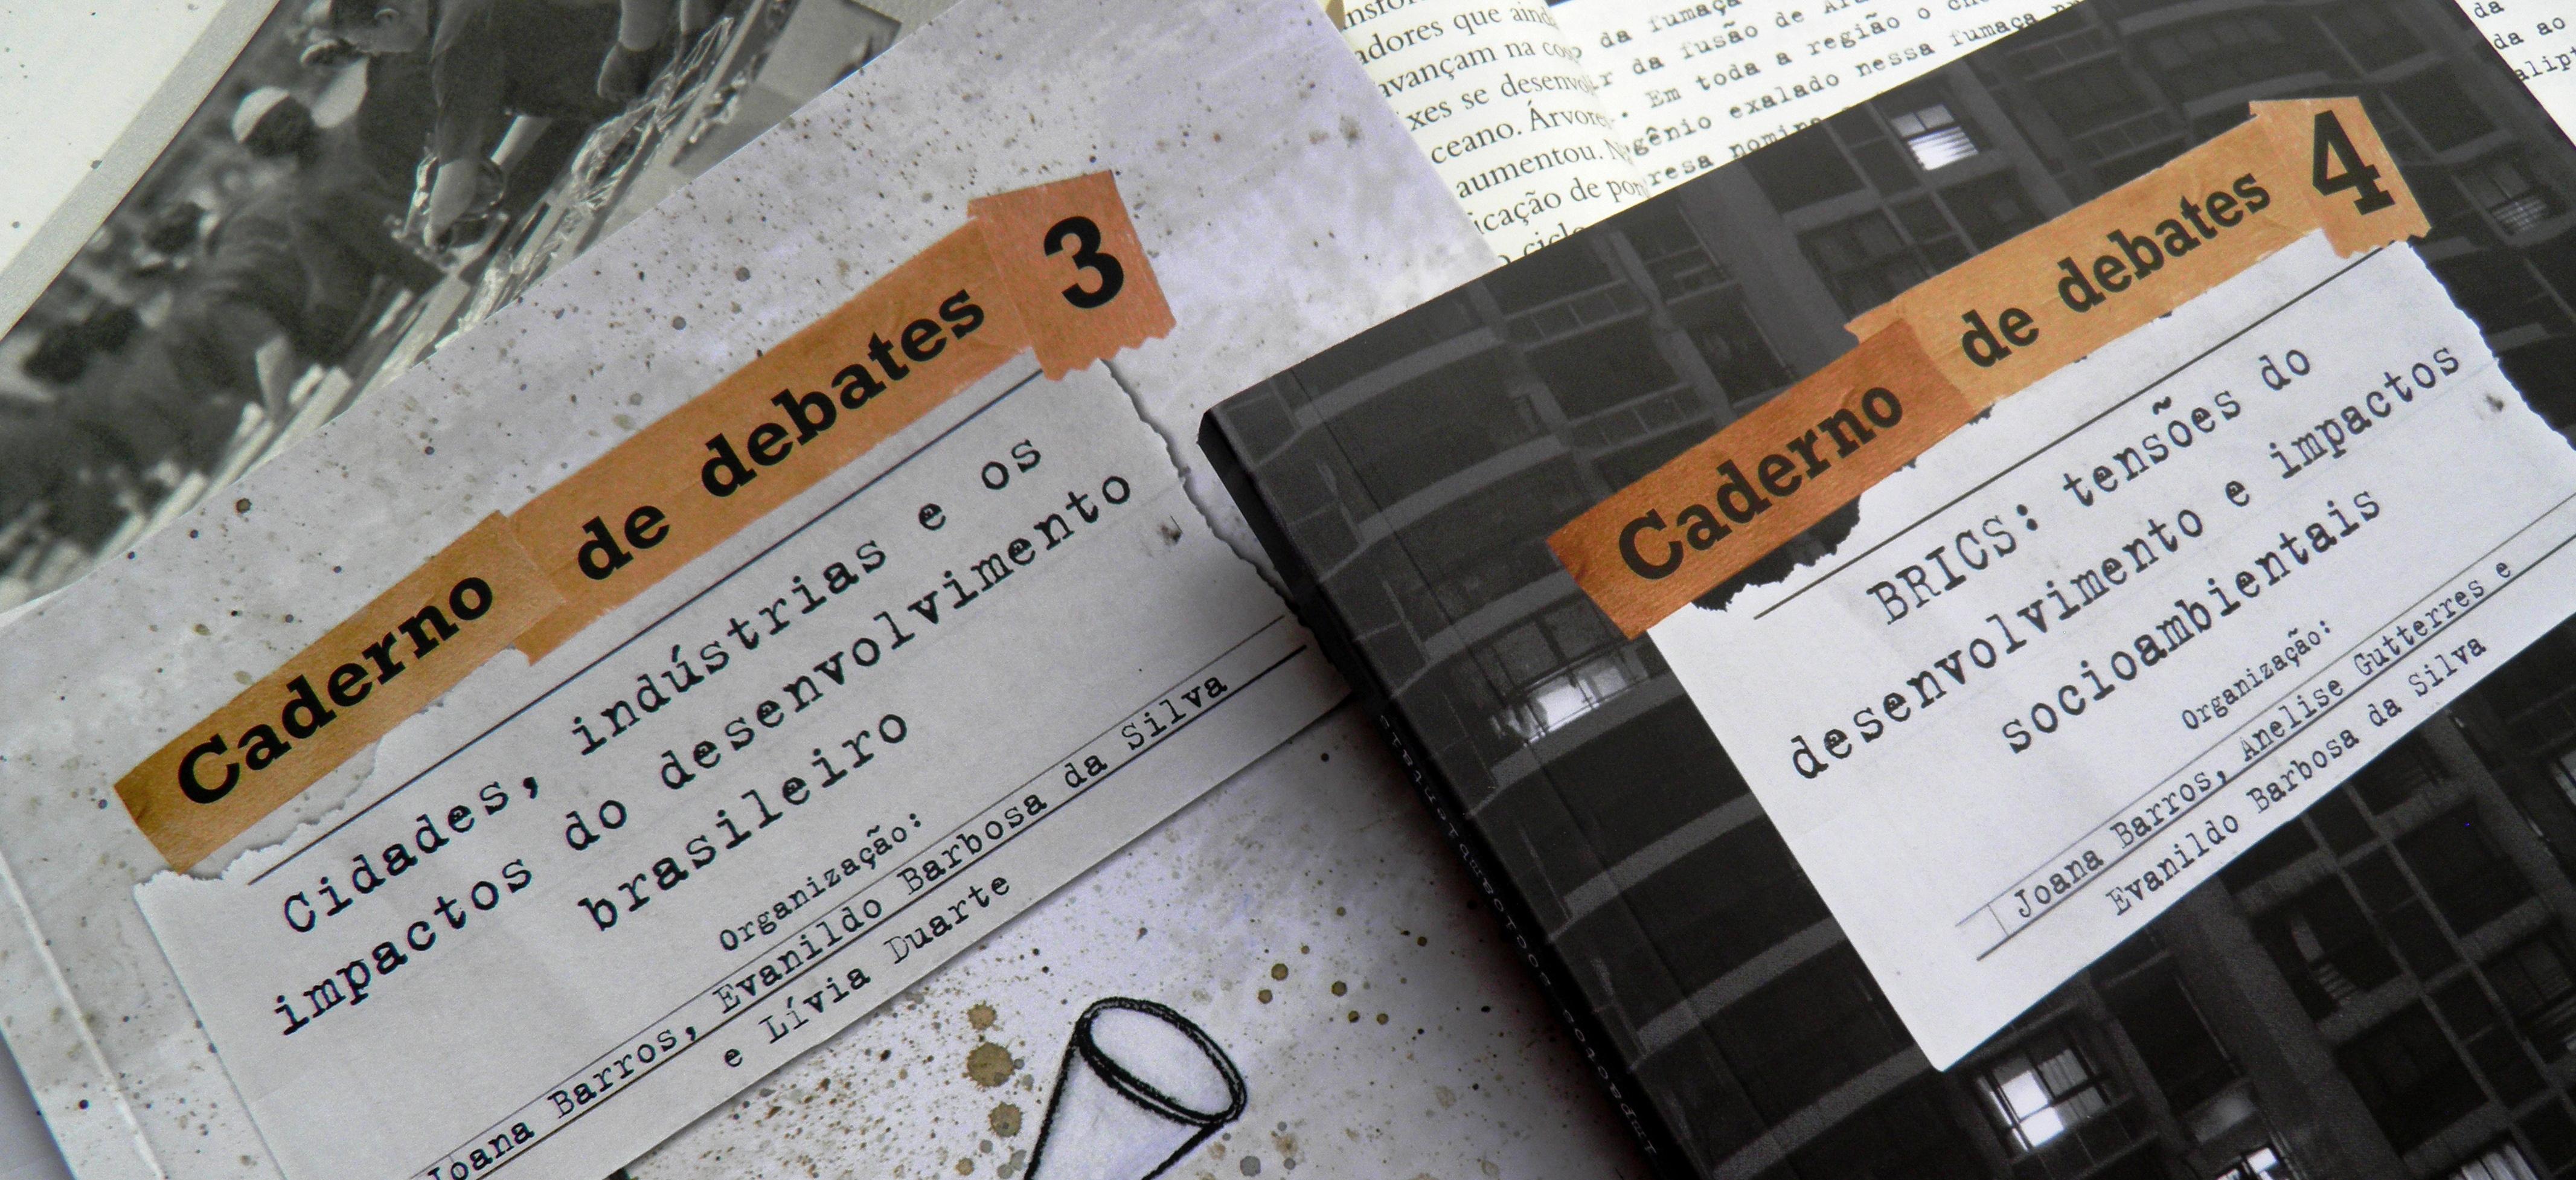 FASE lança dois novos volumes da série Caderno de Debates